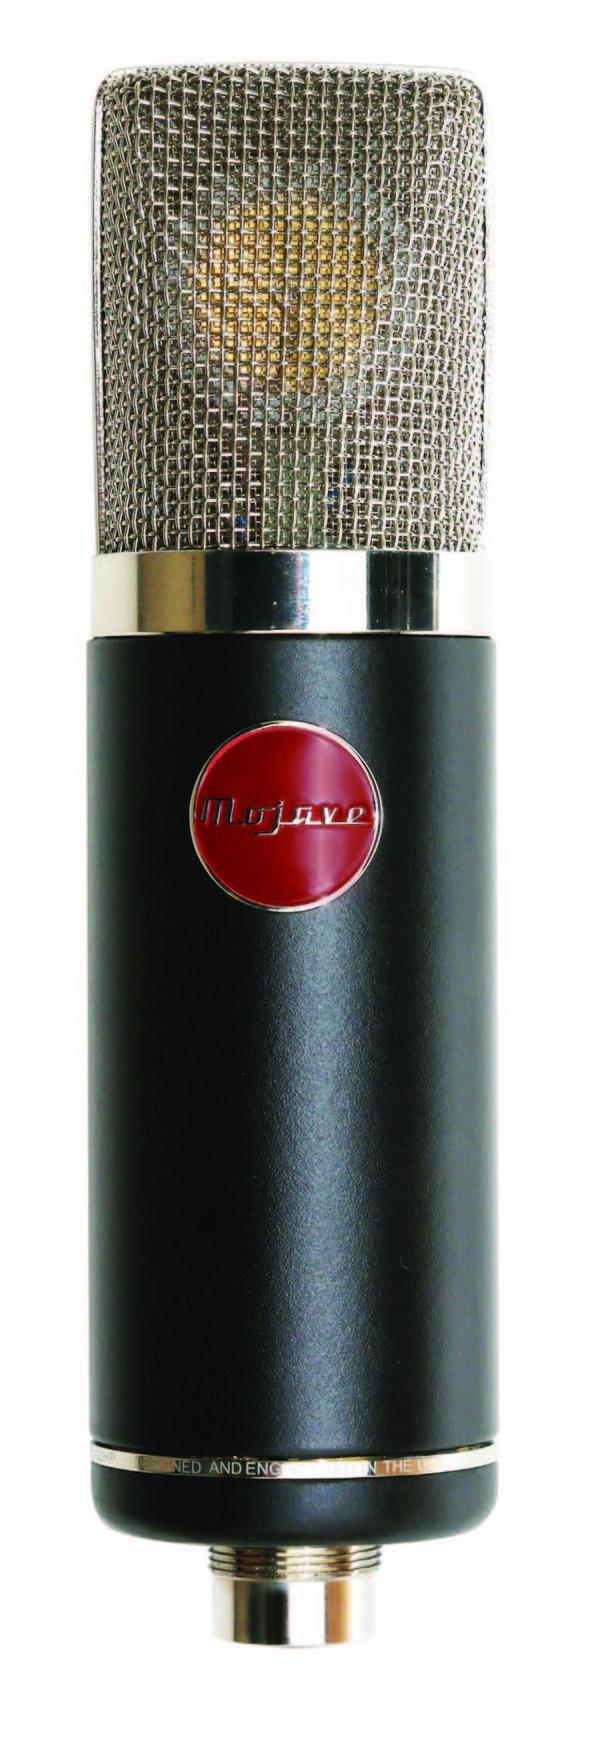 News: Neues Großmembran-Kondensatormikrofon von Mojave Audio